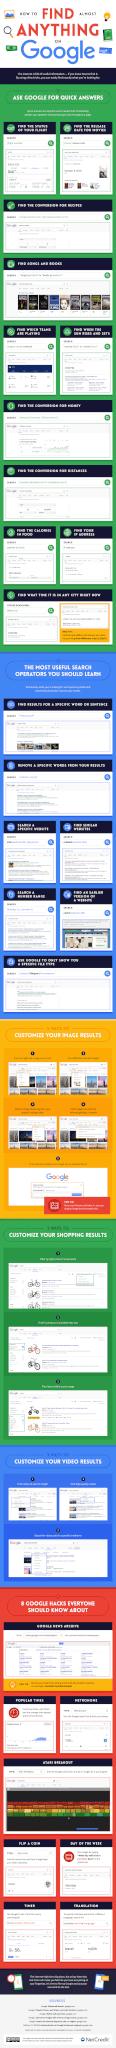 Infographie syntaxe de recherche Google